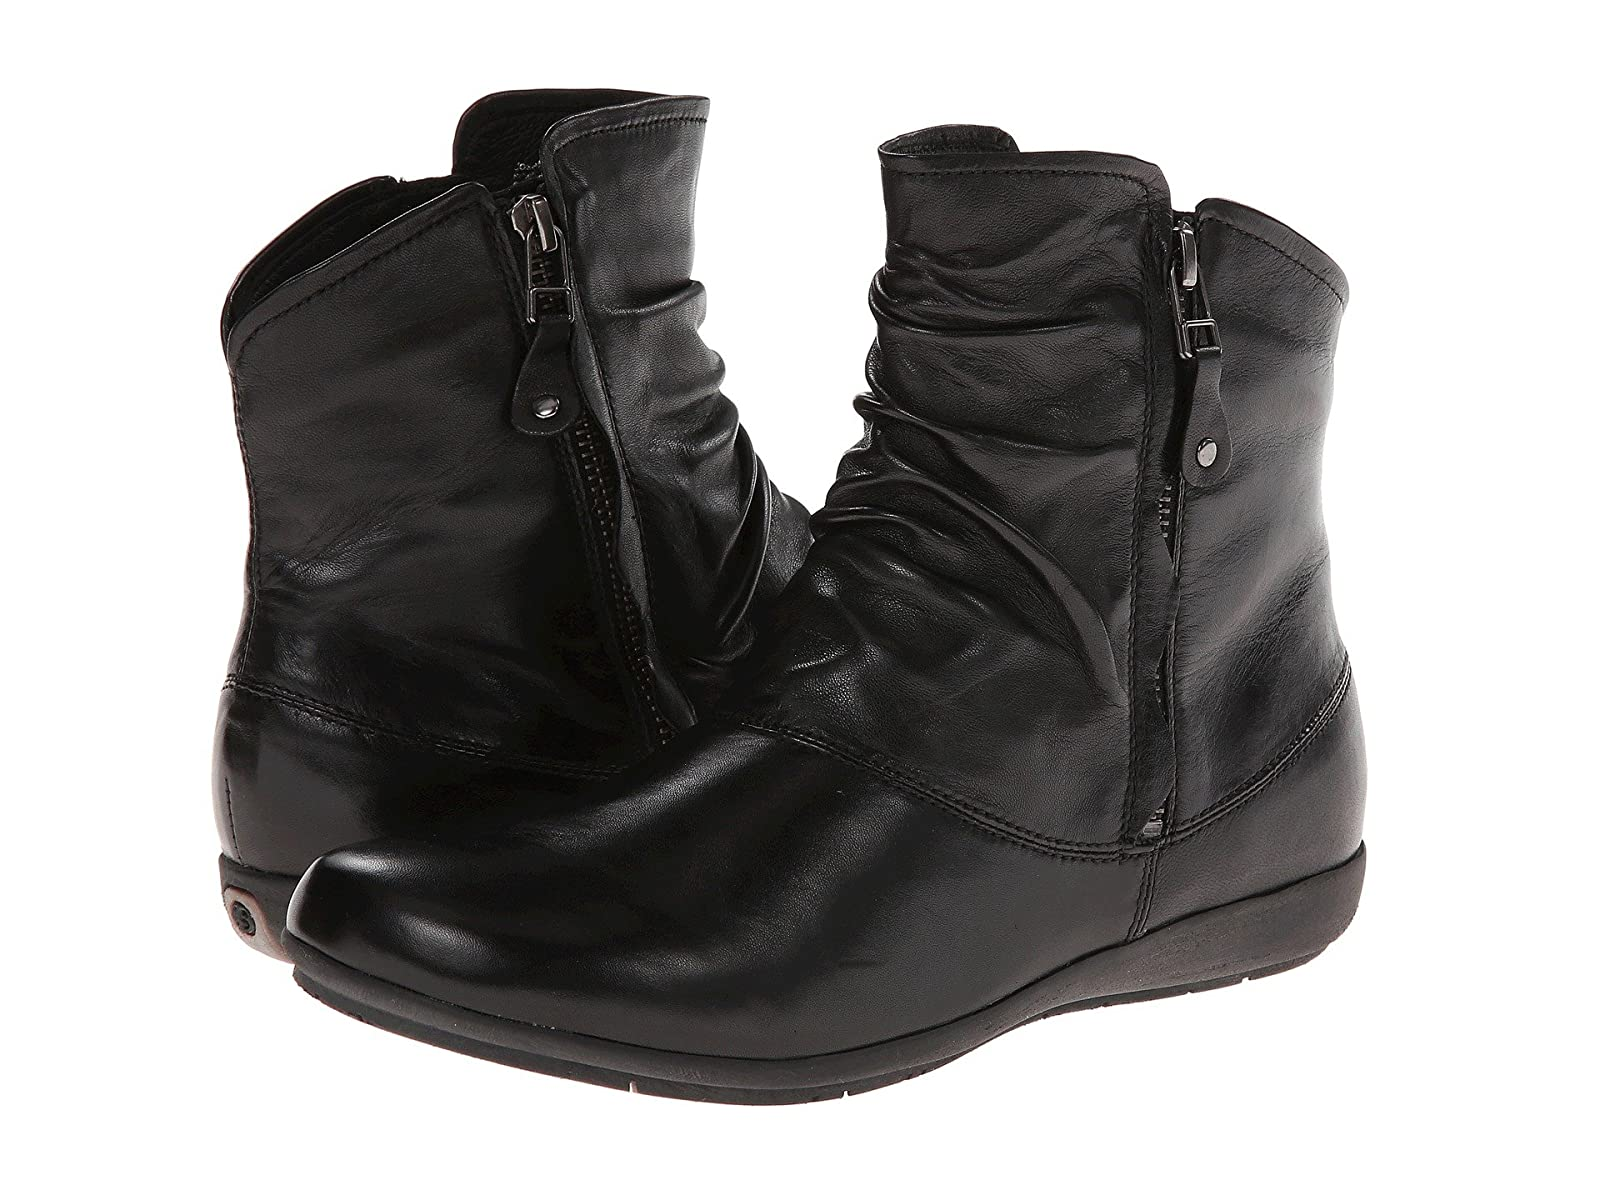 Josef Seibel Faye 05Affordable and distinctive shoes